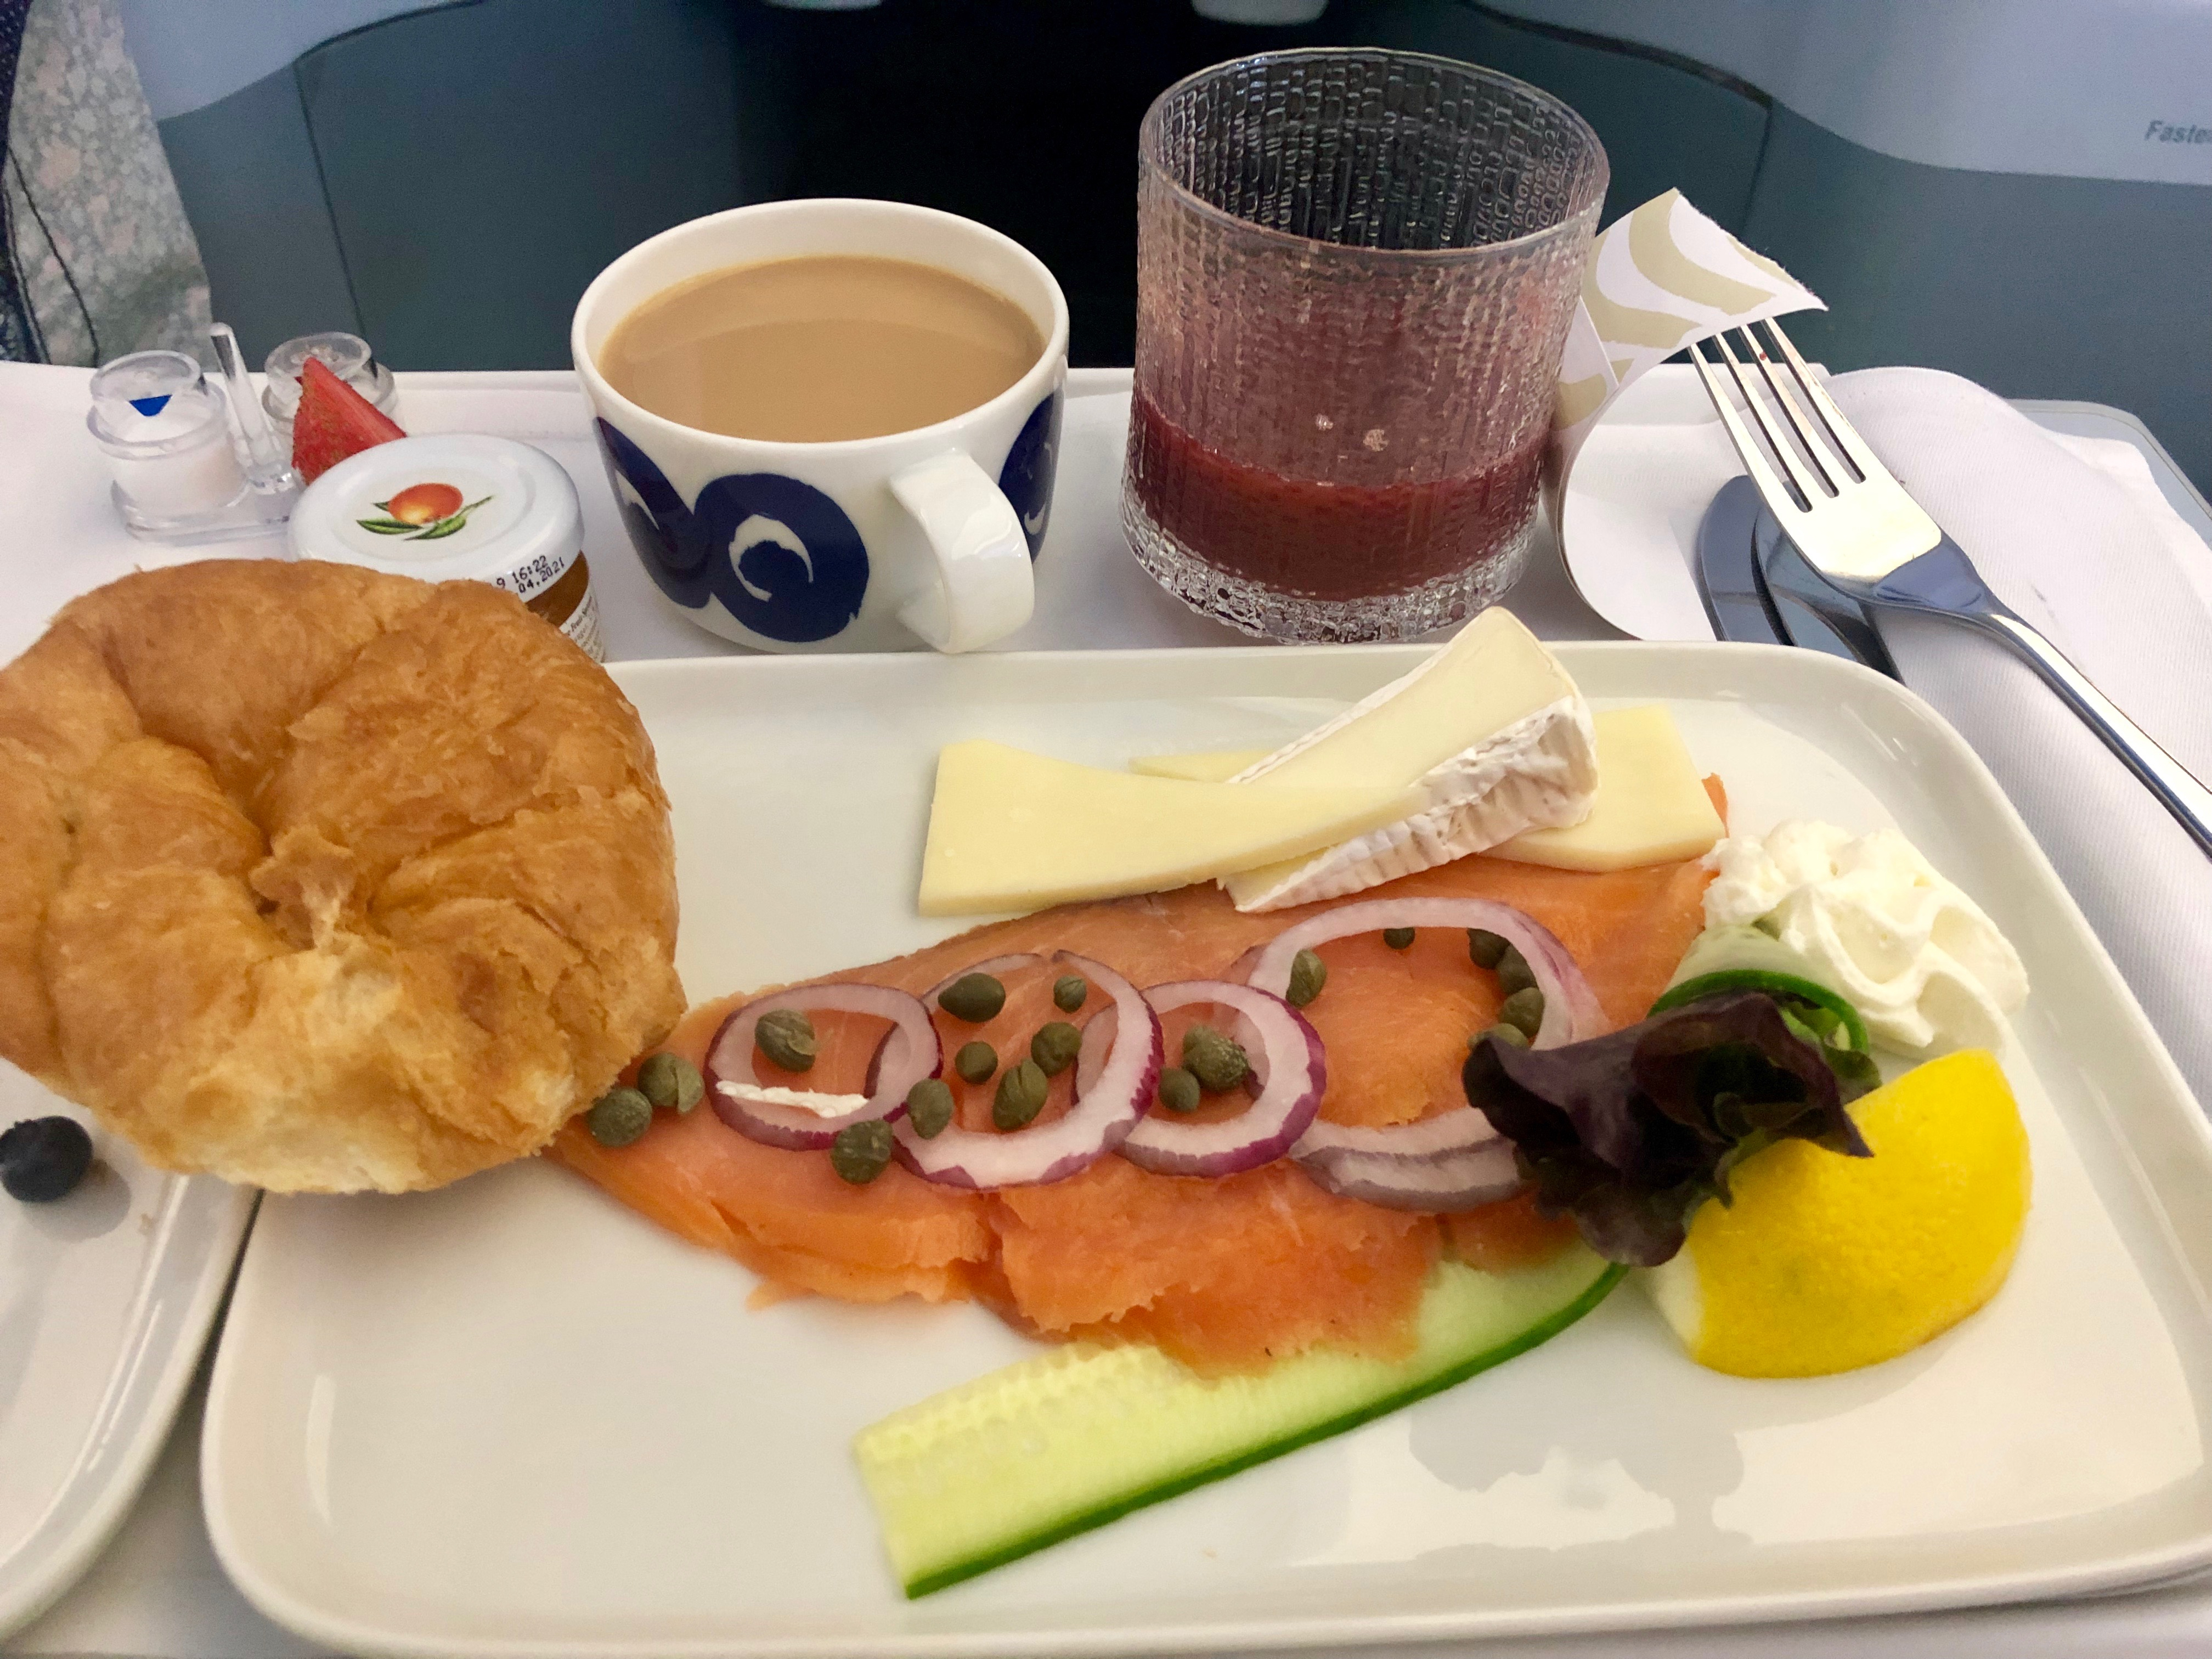 Finnair A330-300 JFK-HEL business class smoked salmon breakfast